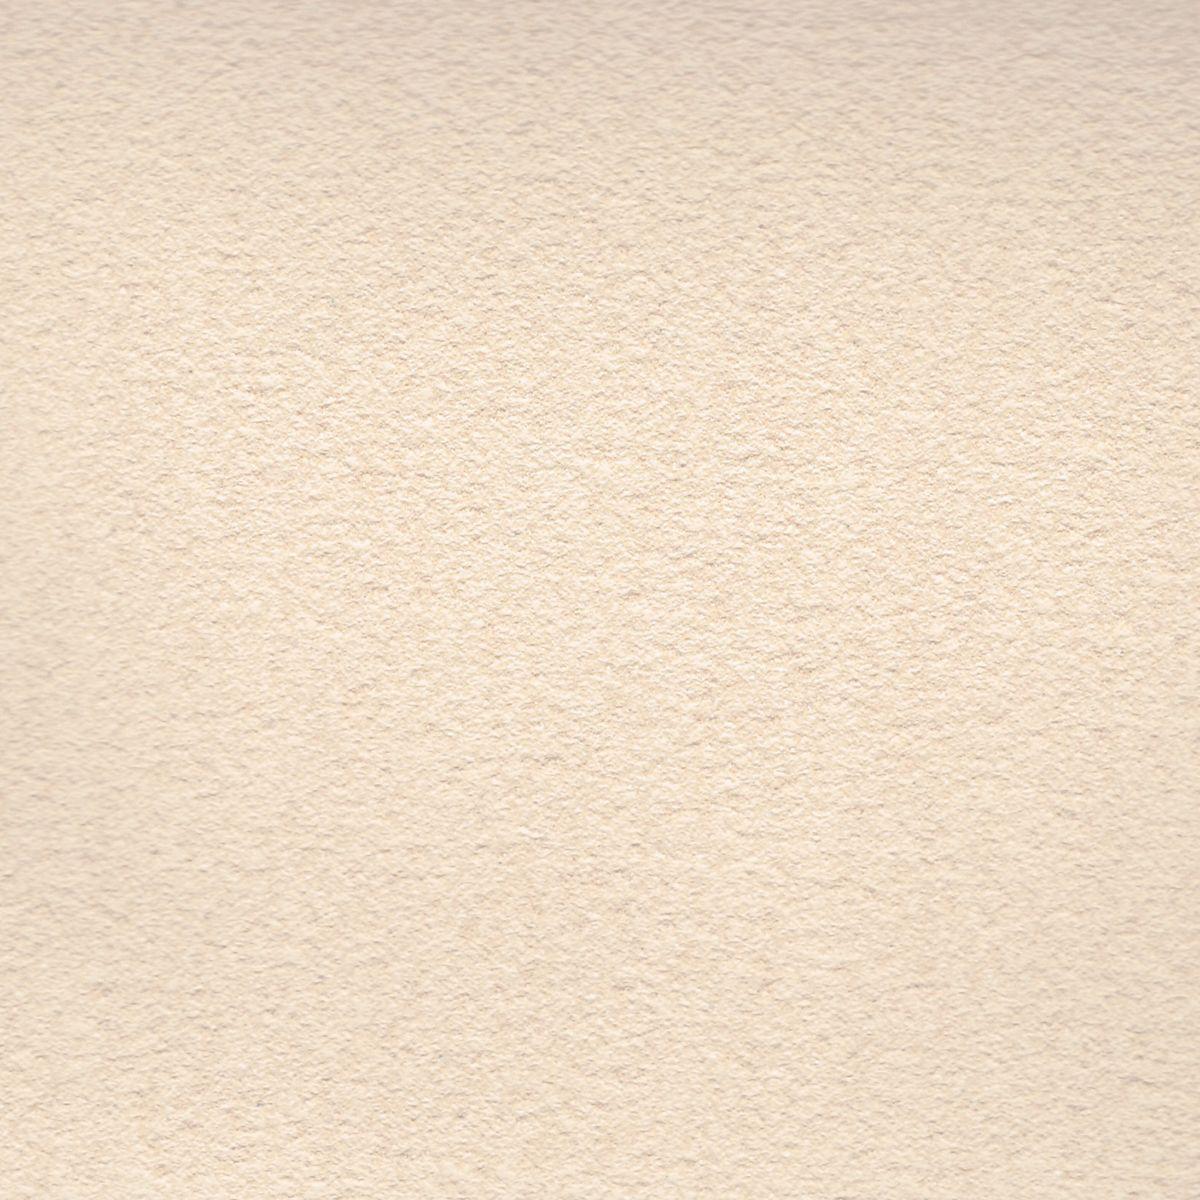 Vernice magnetica leroy merlin interesting inspiration for Pittura con brillantini leroy merlin